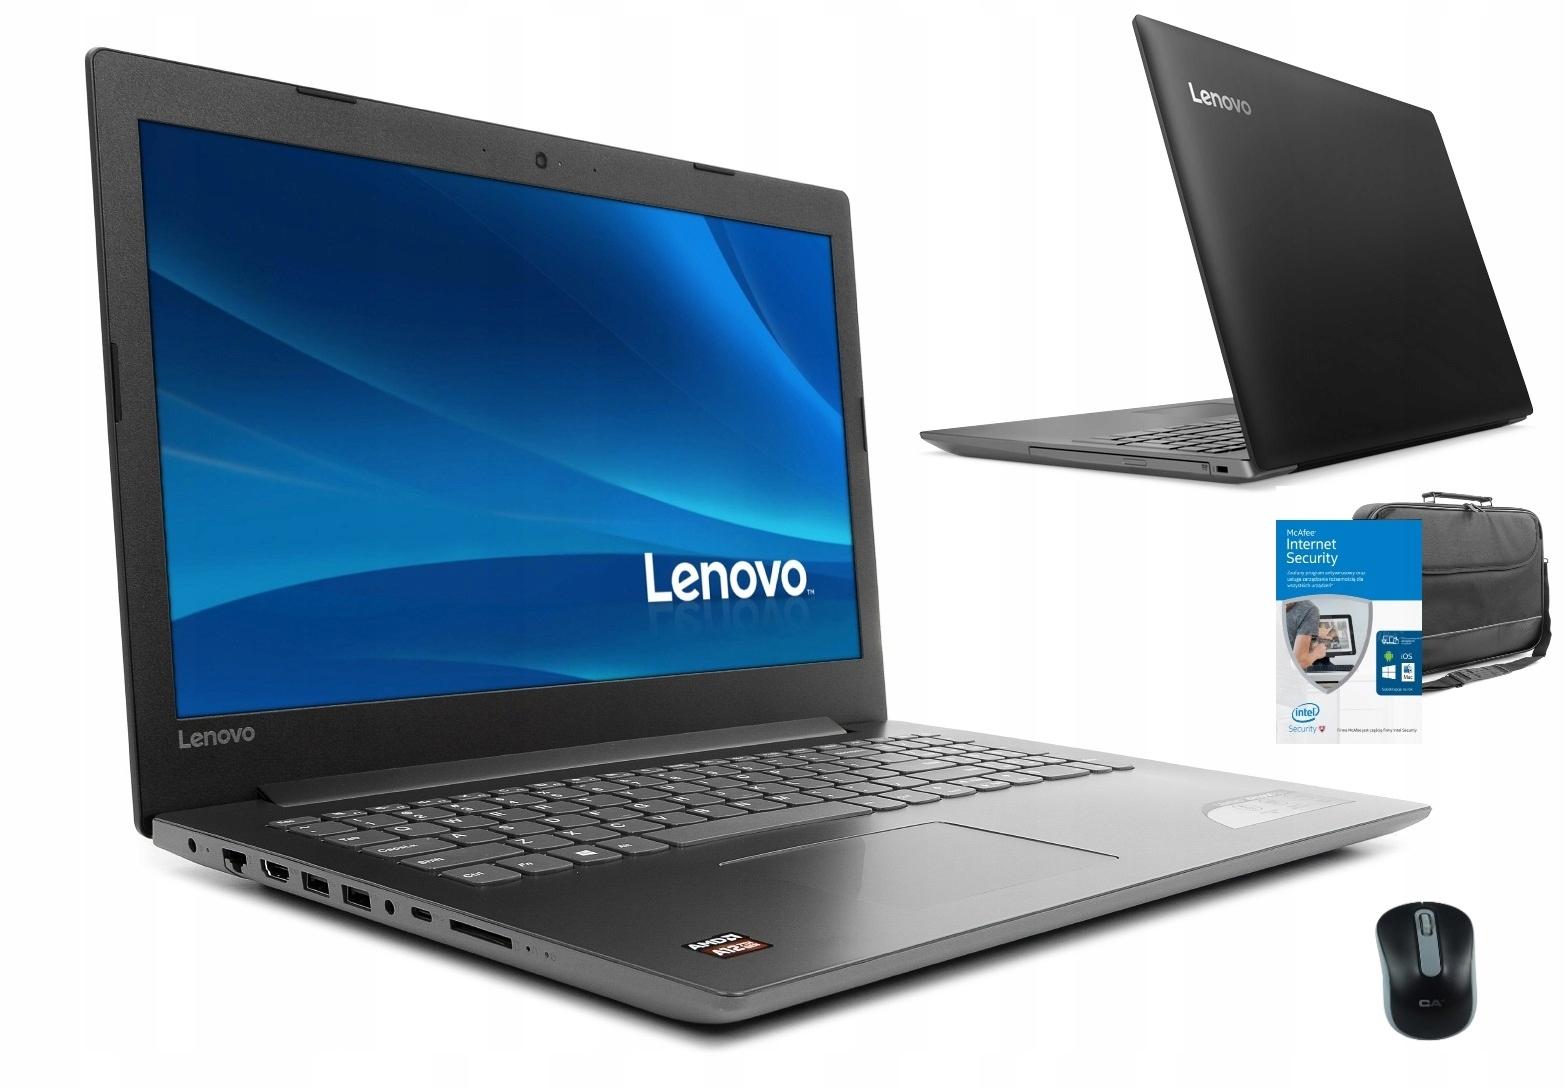 Laptop Lenovo Ideapad 320 i3-8130U 4GB 128SSD